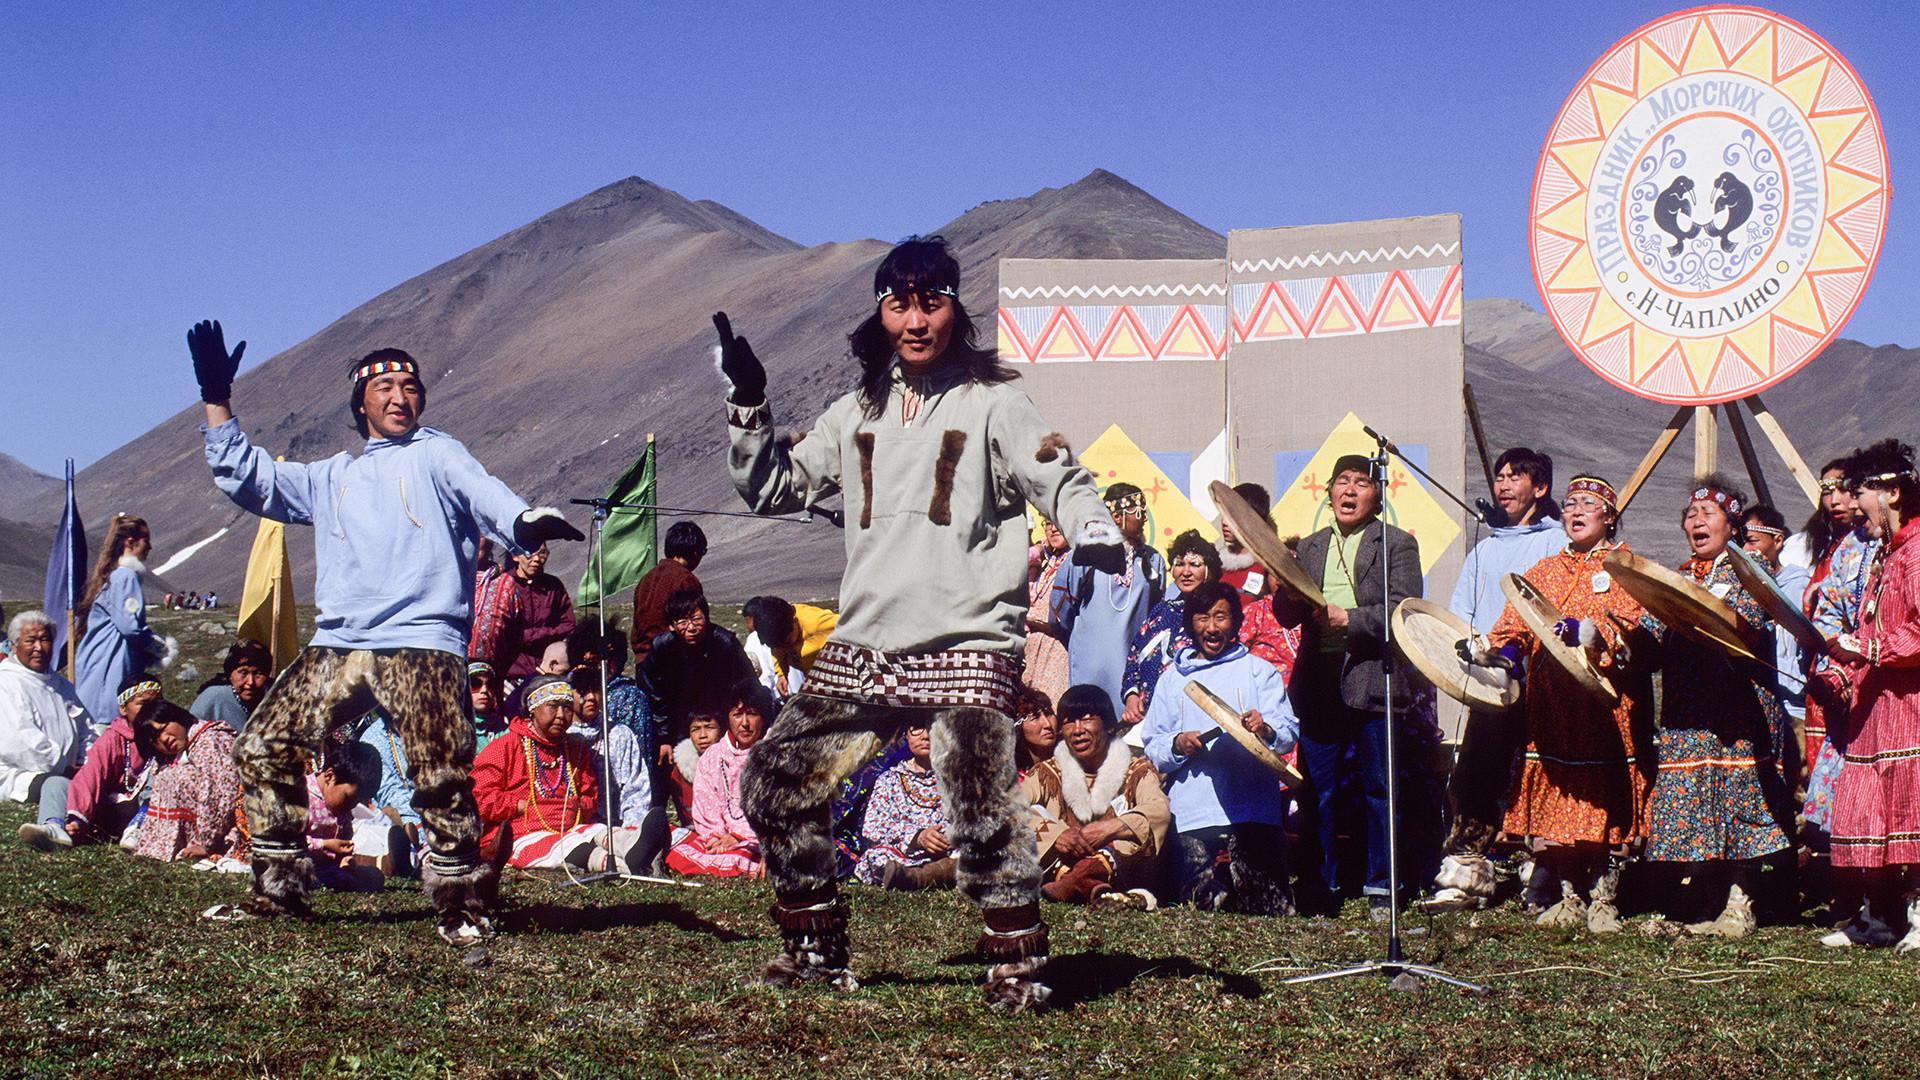 Tradicionalne igre na festivalu lova, Novo Čapljino, Čukotski kraj, Magadanska oblast, Rusija.